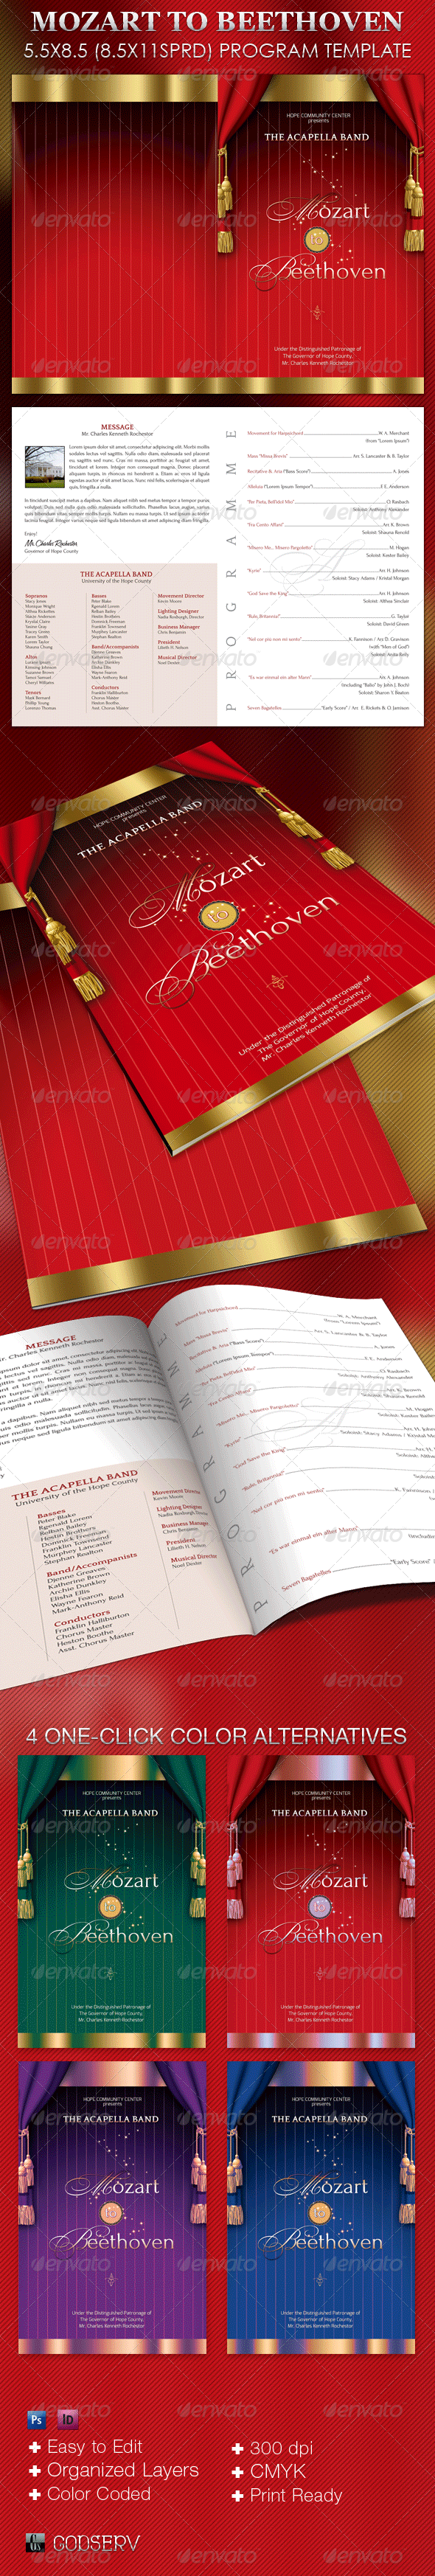 Mozart Beethoven Program Template - Informational Brochures